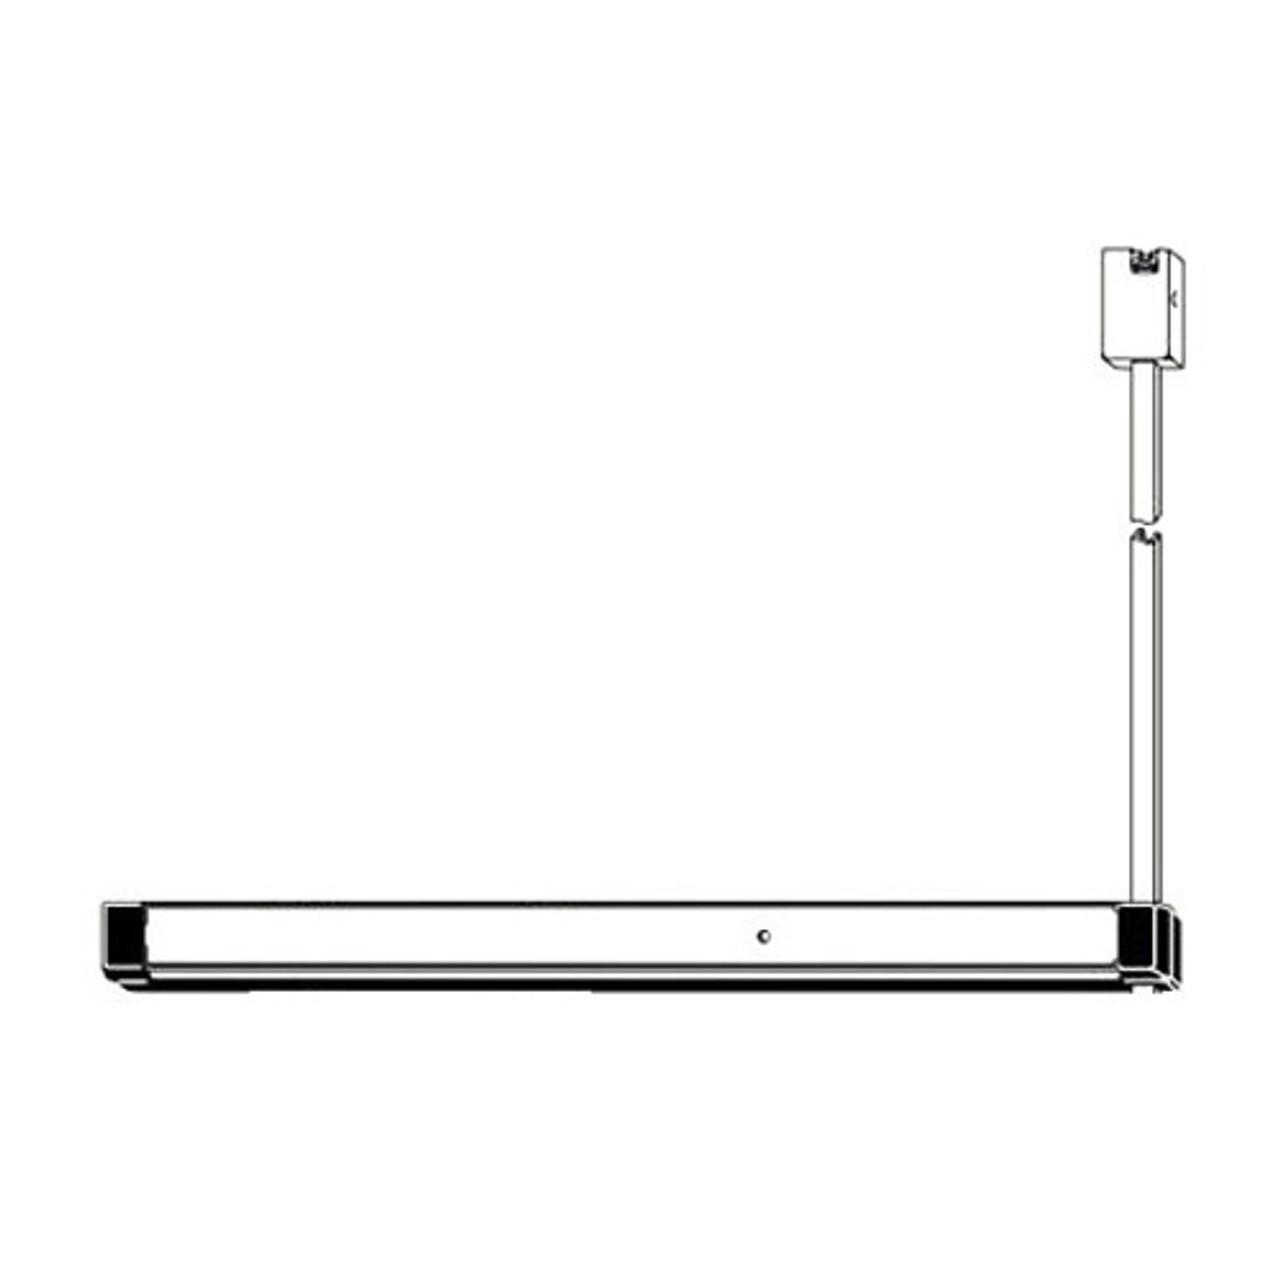 Adams Rite Vertical Rod Exit Device